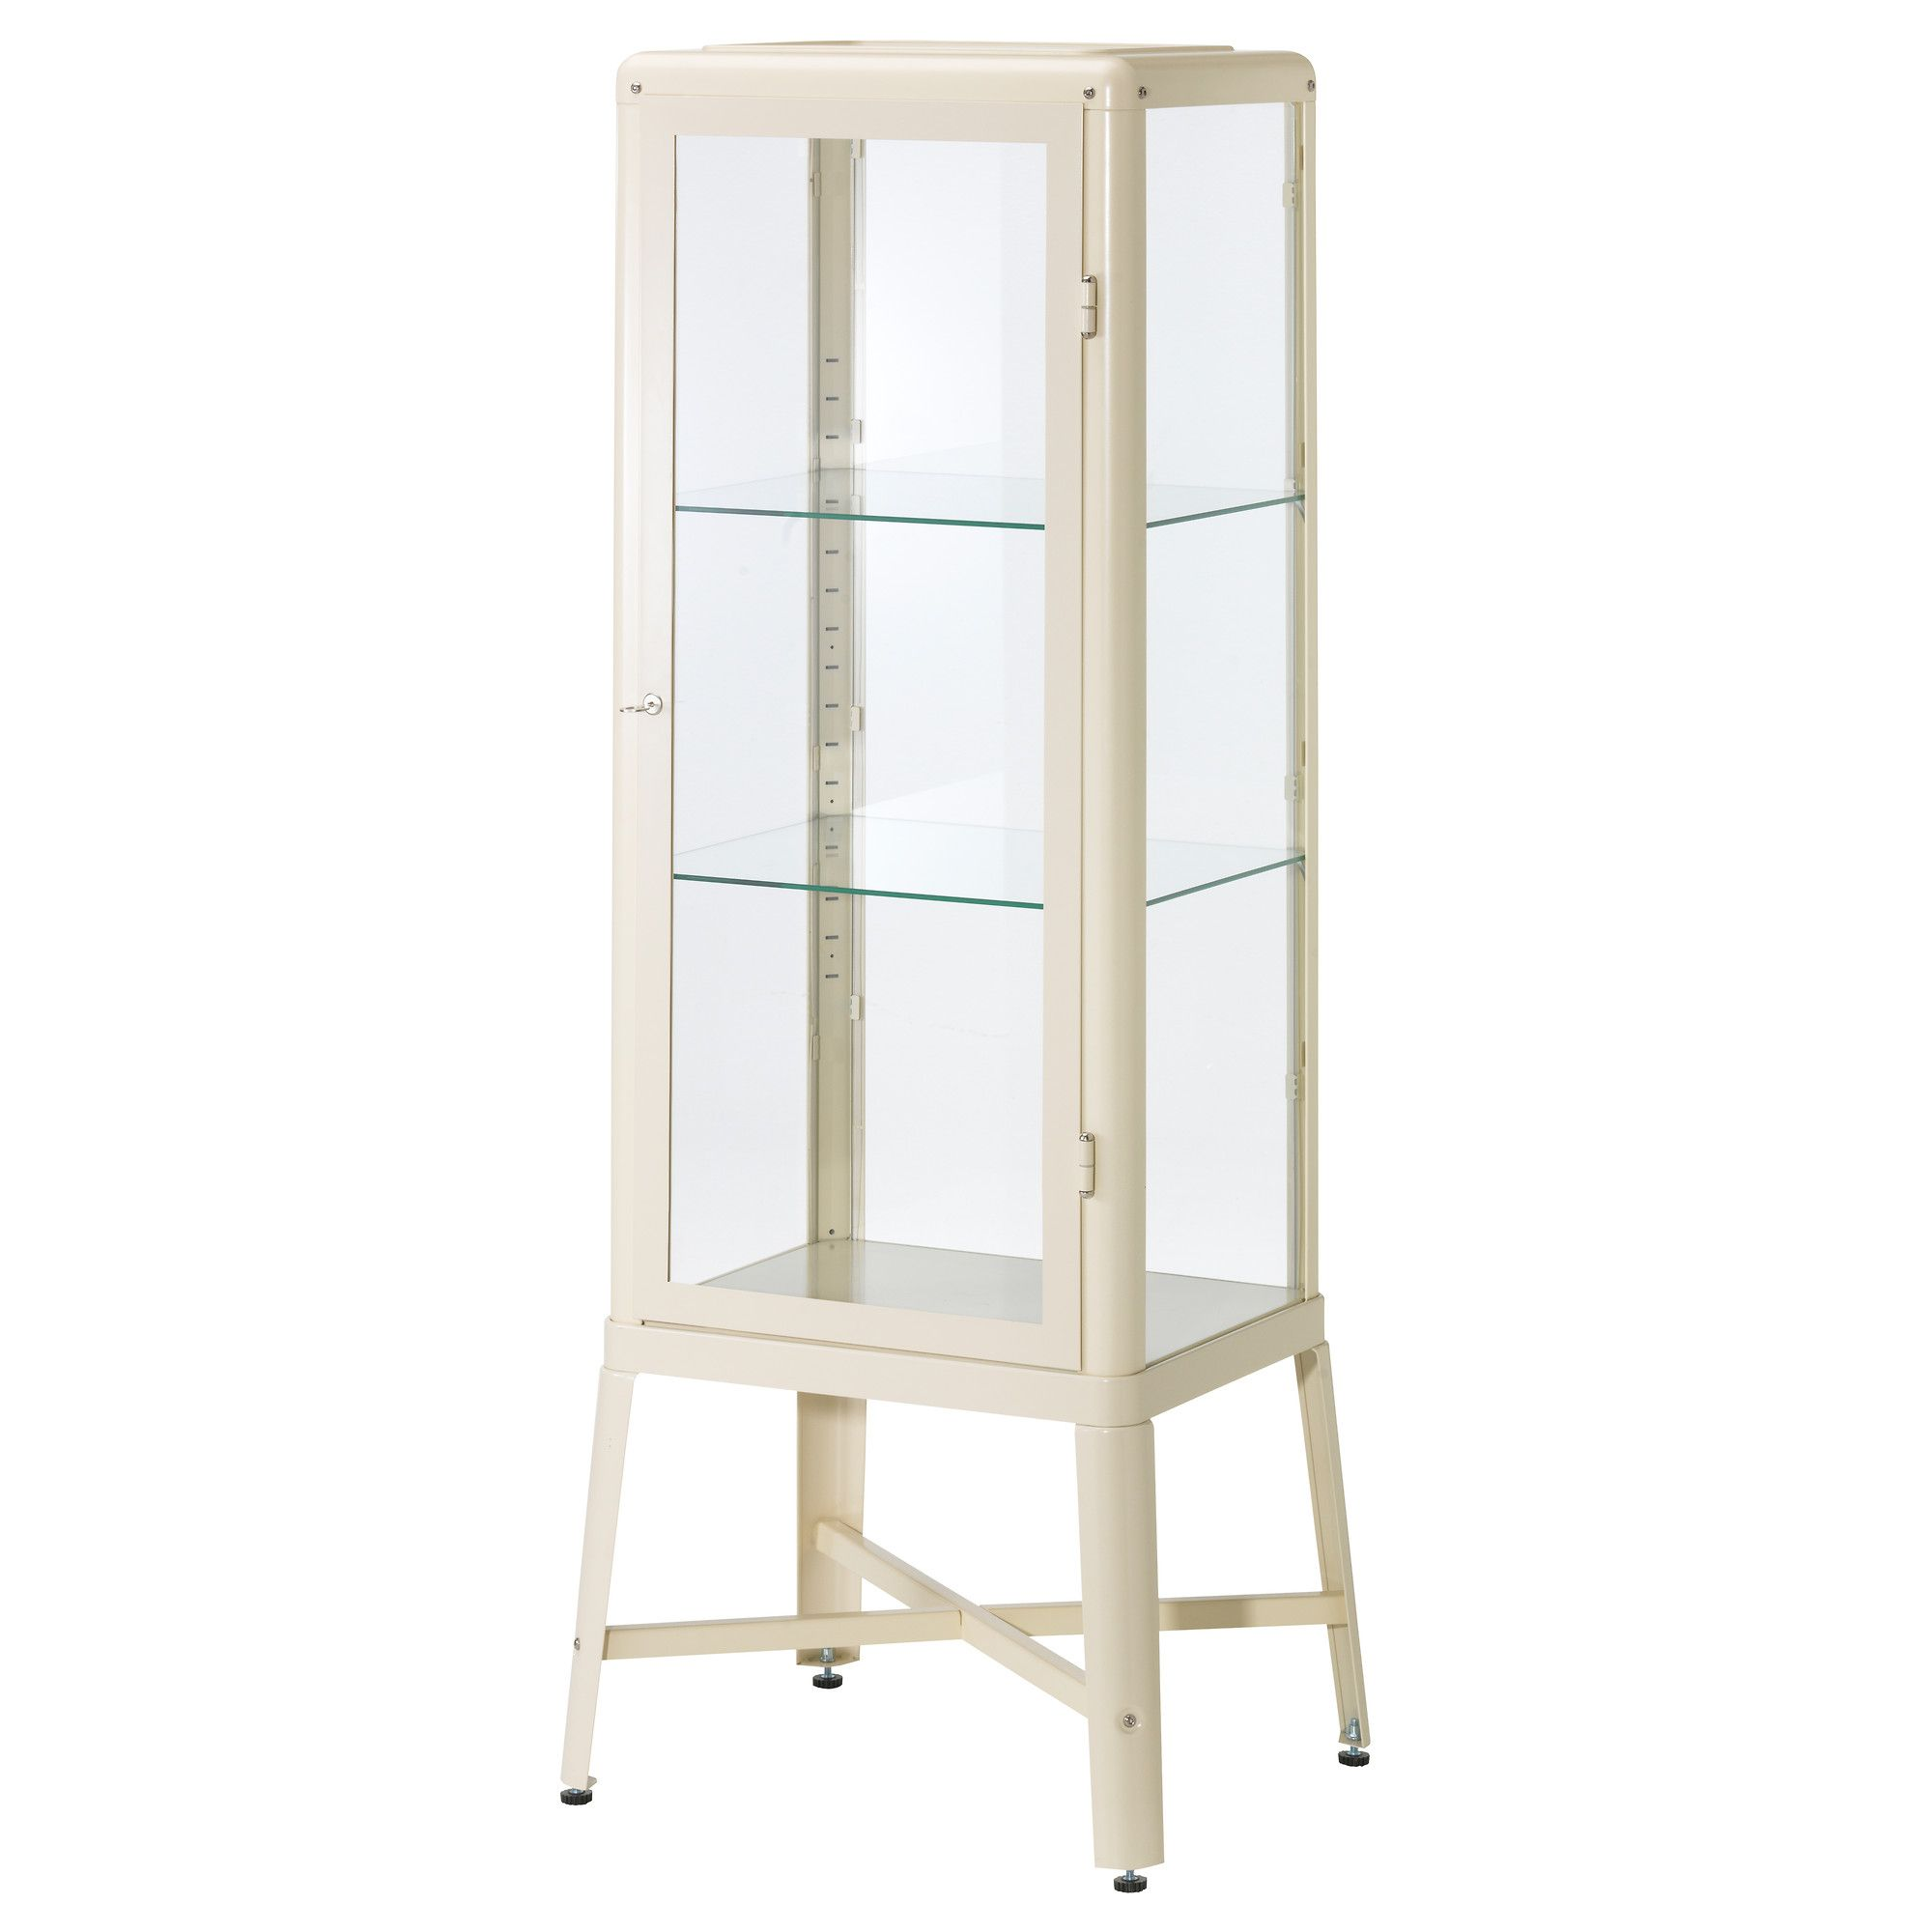 FabrikÖr Vetrina Beige Ikea Fabrikorikea Cabinetsglass Cabinetsdisplay